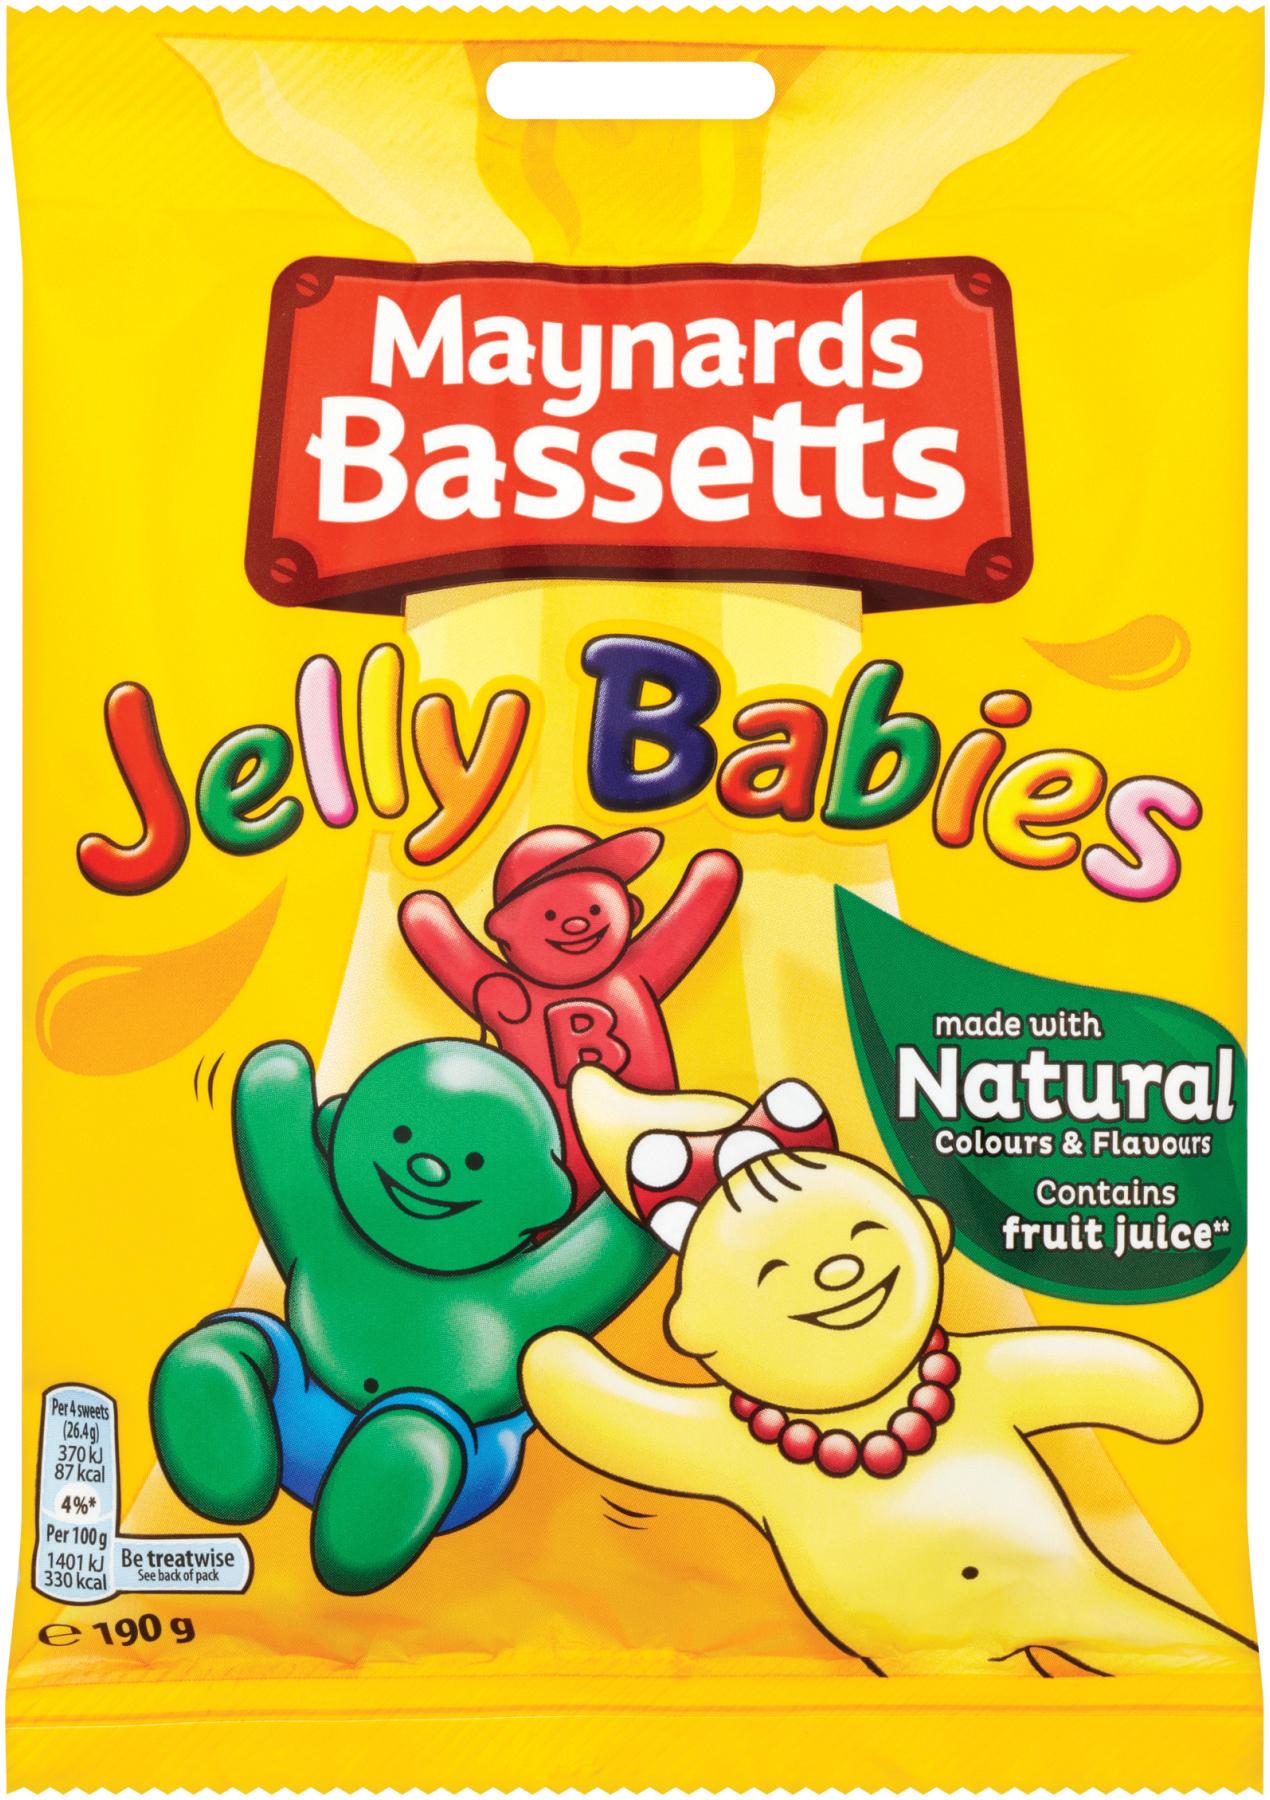 Maynards_Bassetts_Jelly_Babies_Sweets_Bag_190g_7622300700157